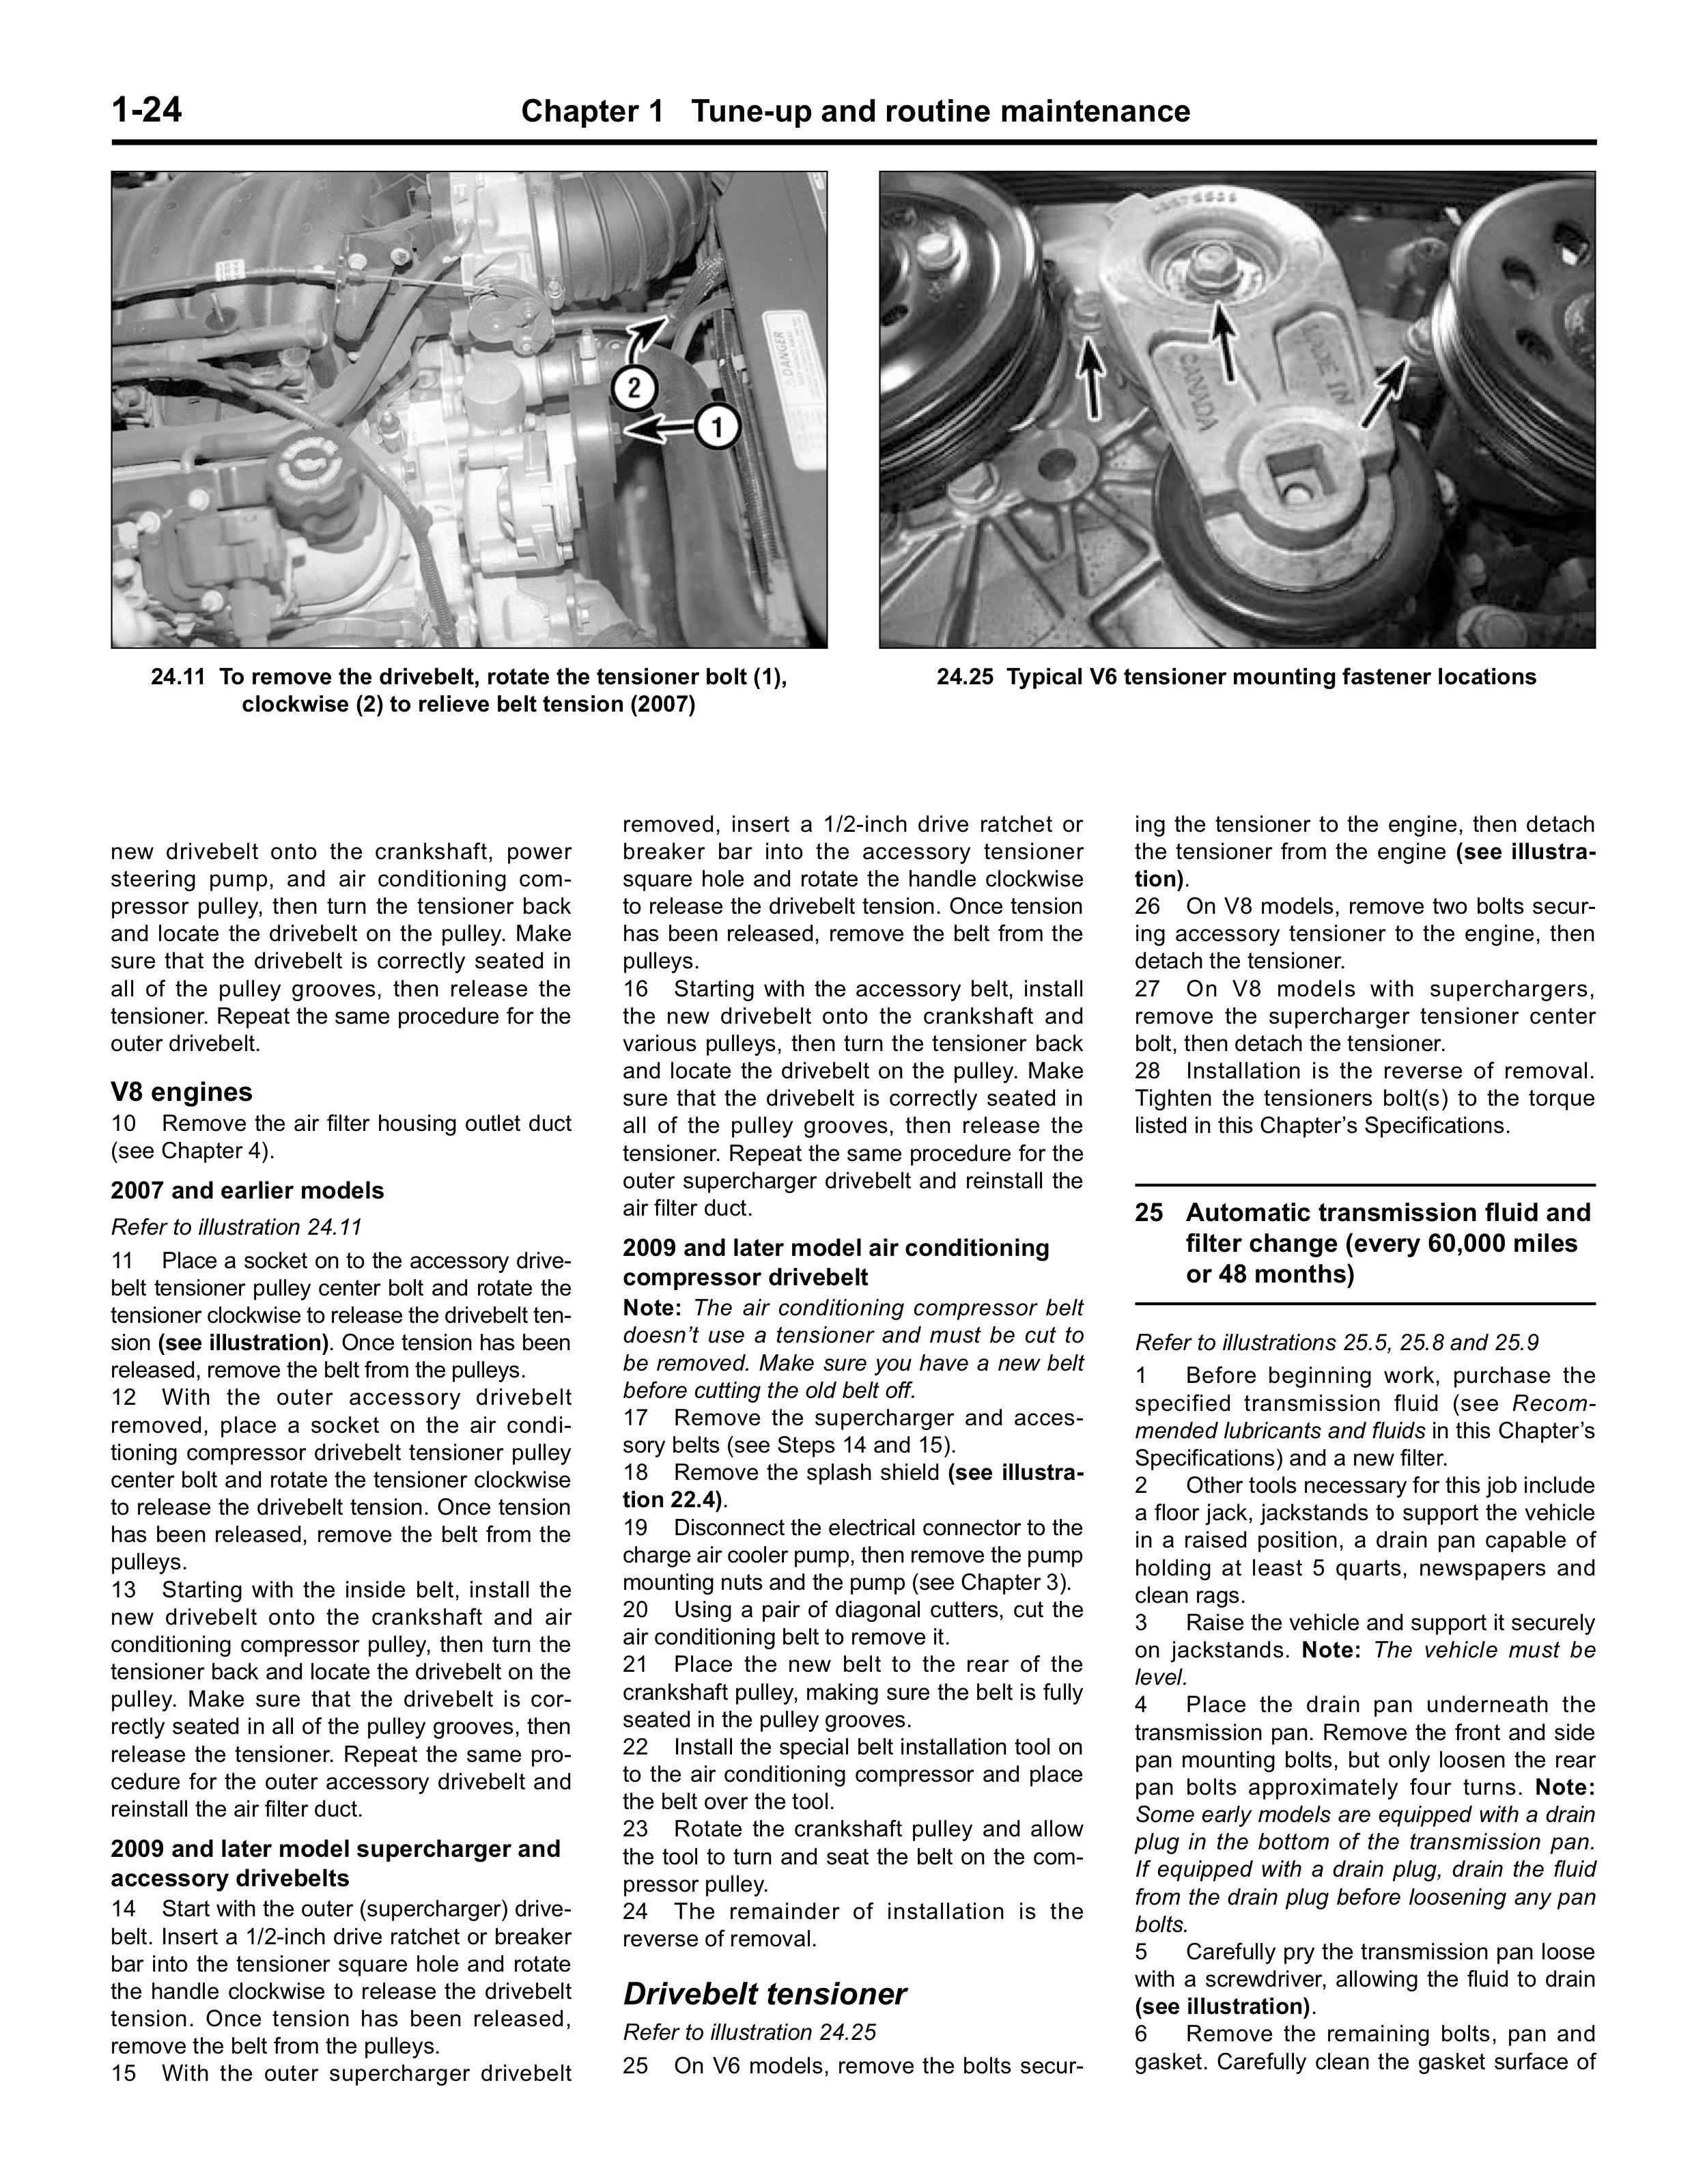 acura integra 90 93 legend 91 95 haynes repair manual haynes rh haynes com 1991 acura integra service manual 1991 acura integra service manual